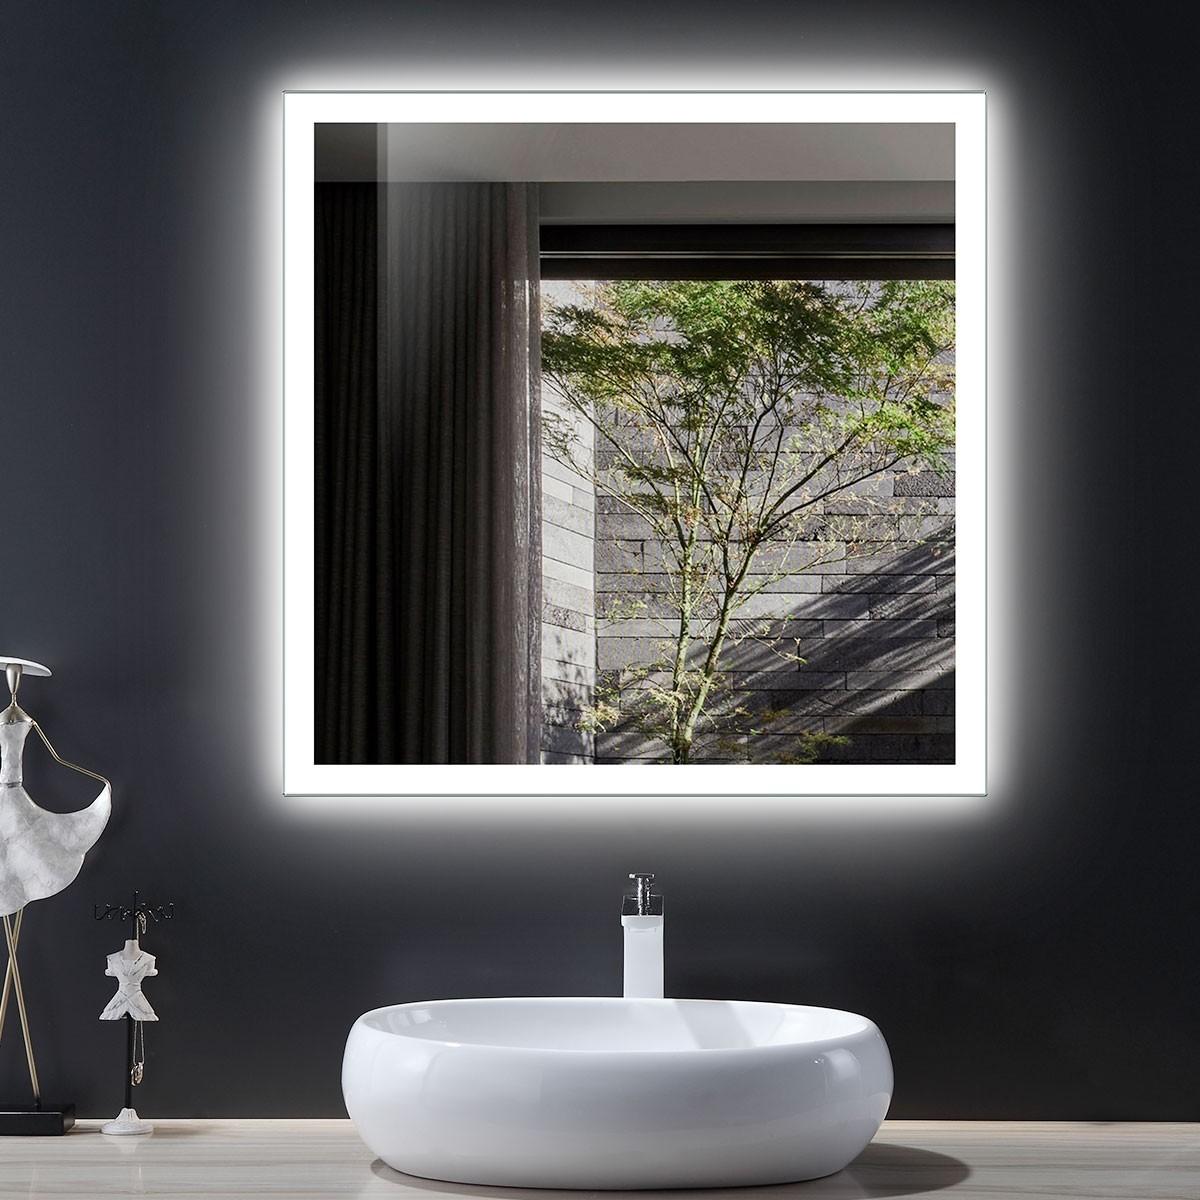 DECORAPORT 36 x 36 Inch LED Bathroom Mirror/Dress Mirror with Infrared Sensor Control, Anti-Fog, Vertical & Horizontal Mount (NG12-3636)